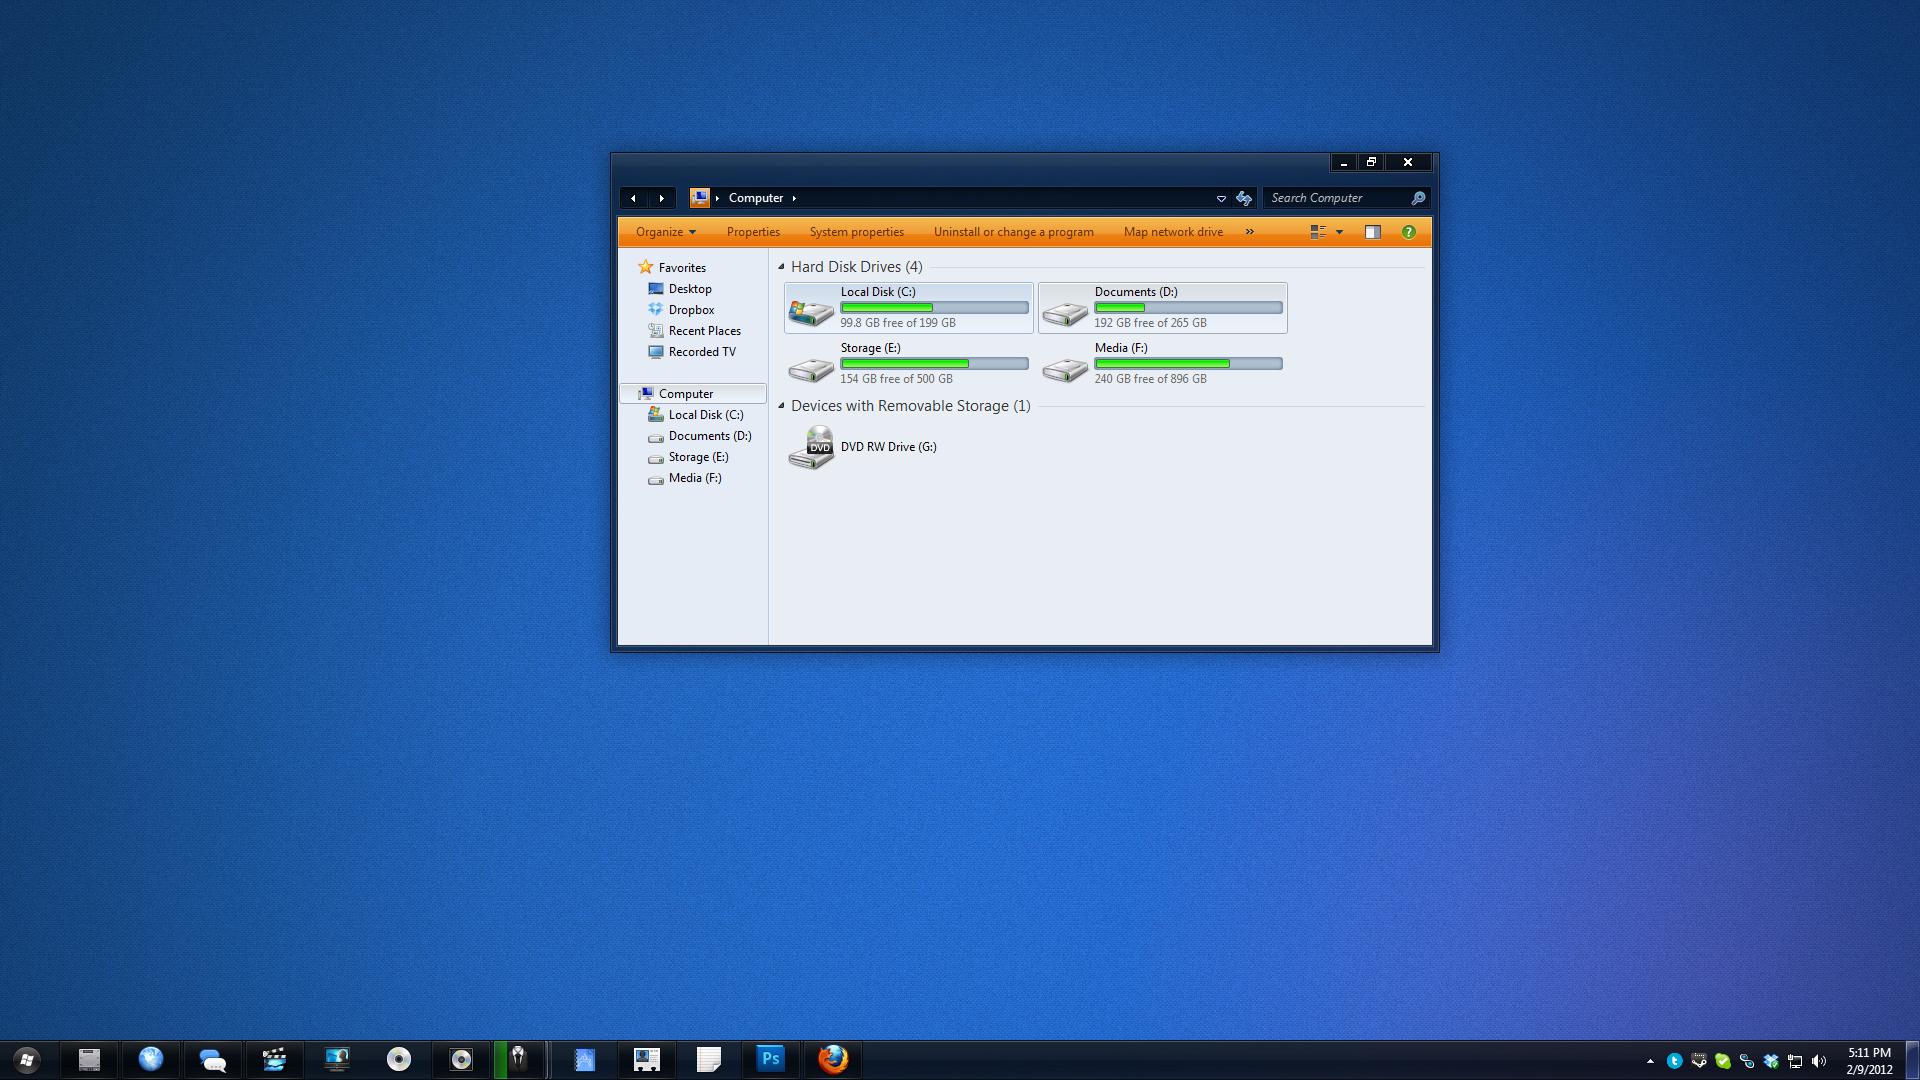 Osituro - Windows 7 VS - WIP by Renacac